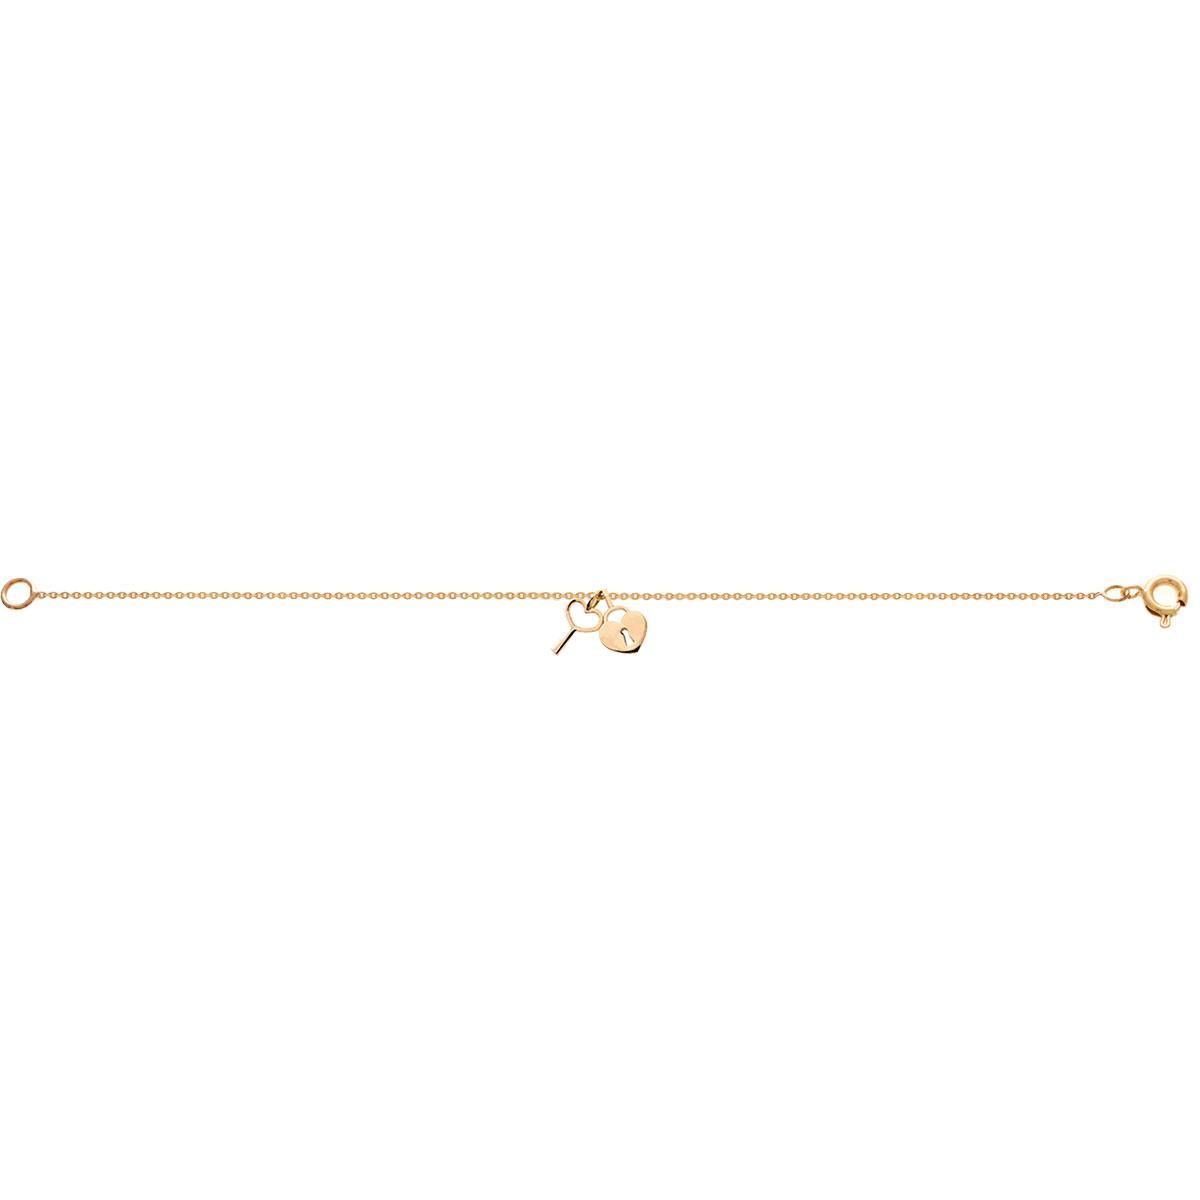 پرسته پابند طلا قفل قلب و کلید